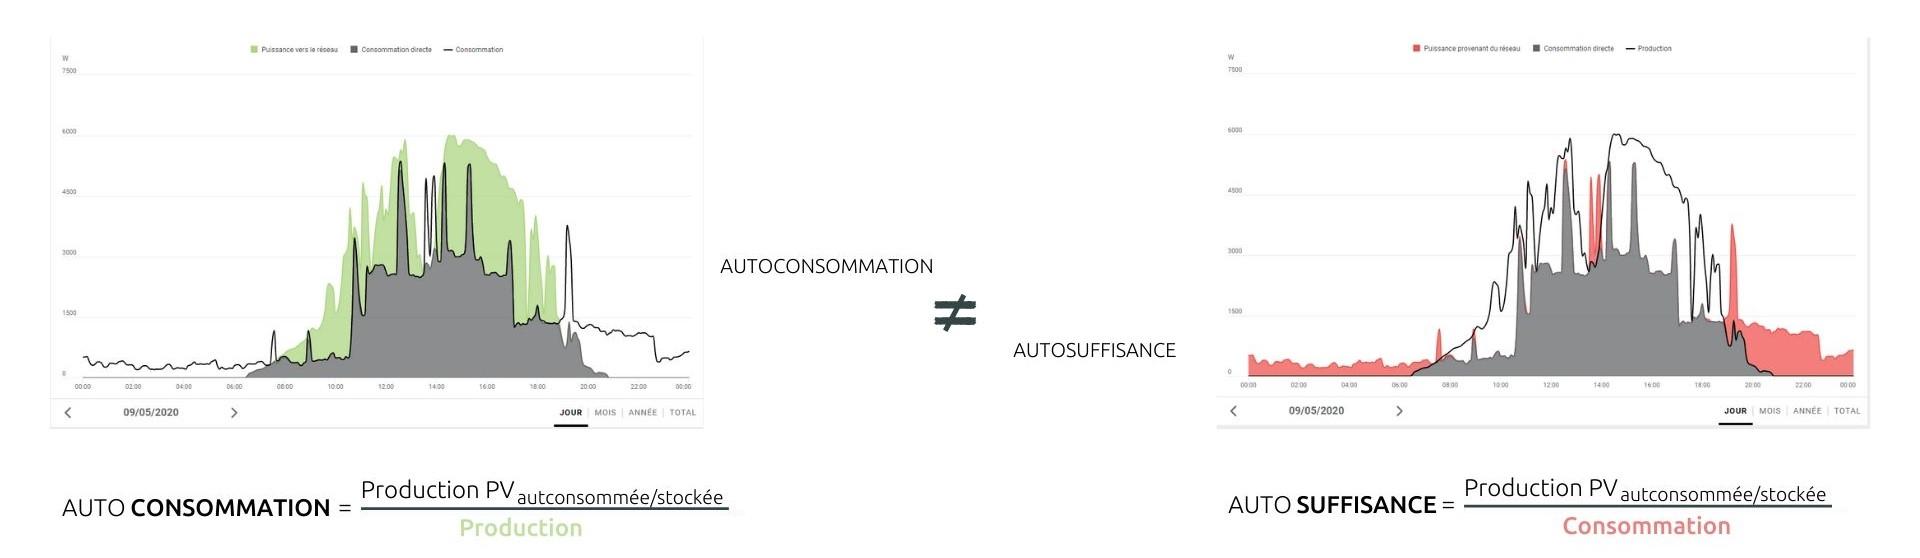 autoconsommation-autosuffisance